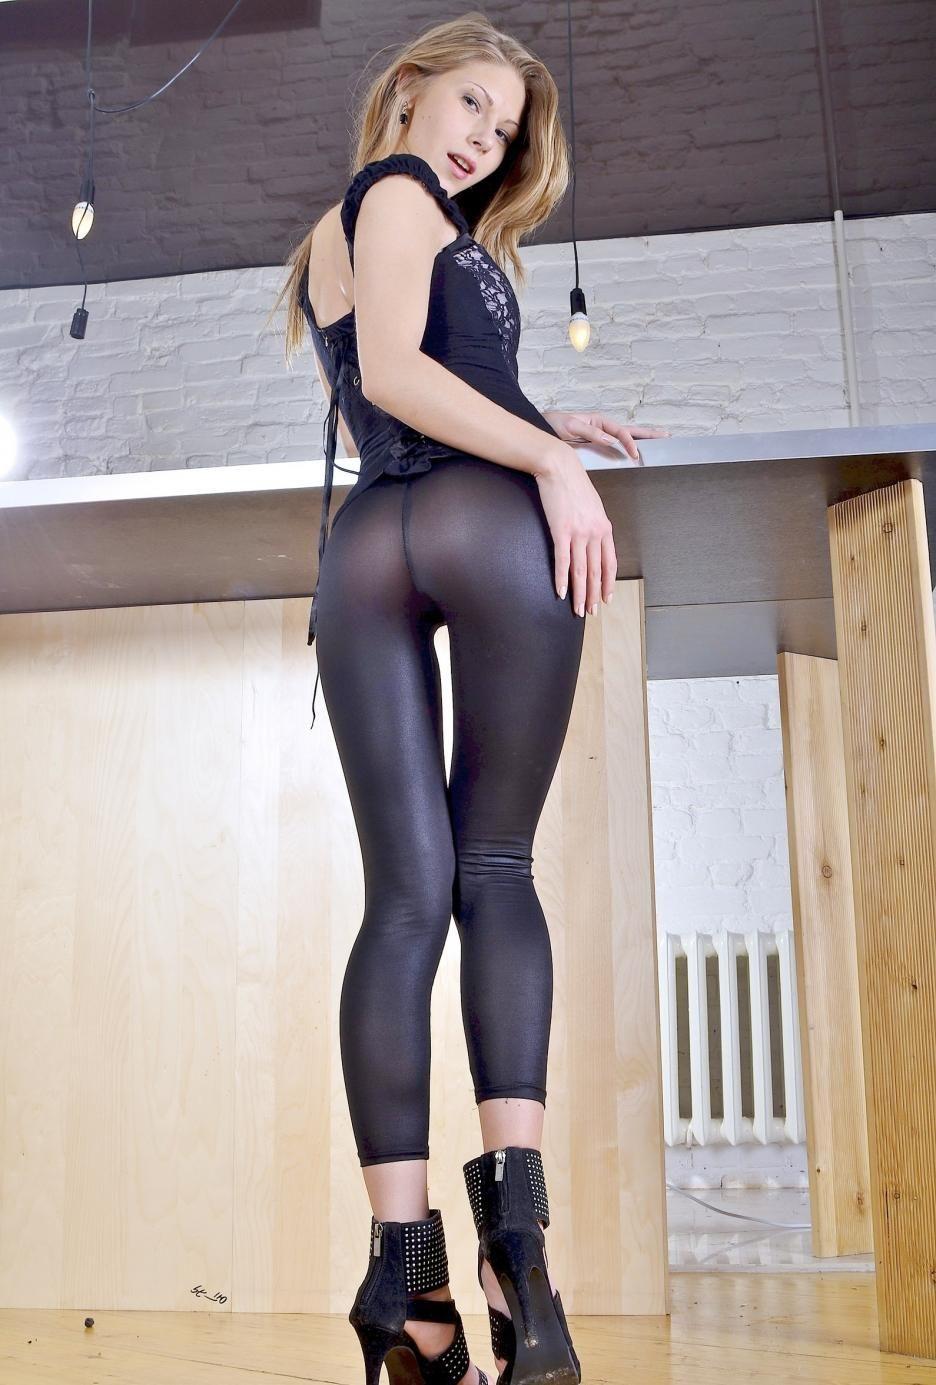 photo Angelica neri blonde in corset